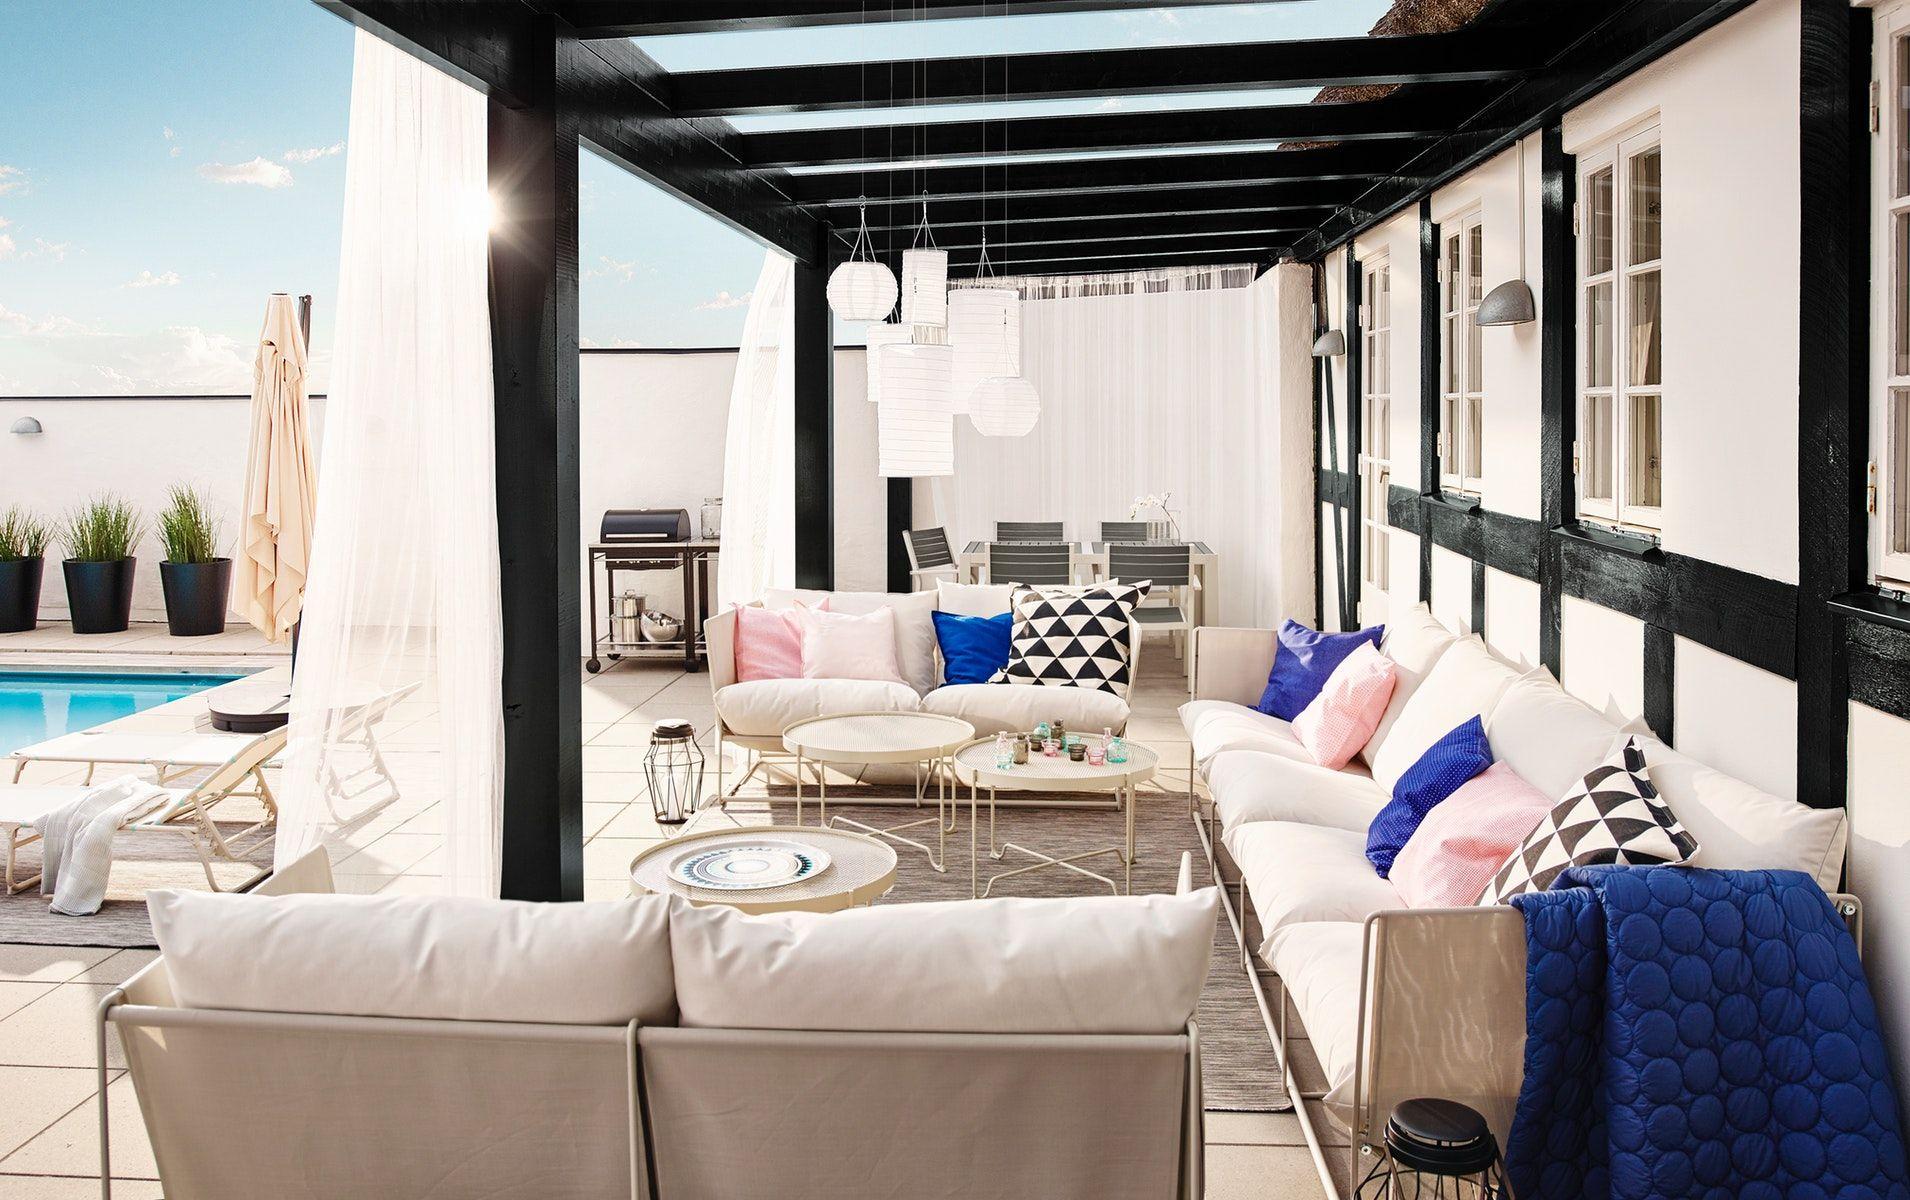 Havsten 2-Seat Sofa, In/outdoor - Beige - Ikea Switzerland ... pour Salon De Jardin Ikea